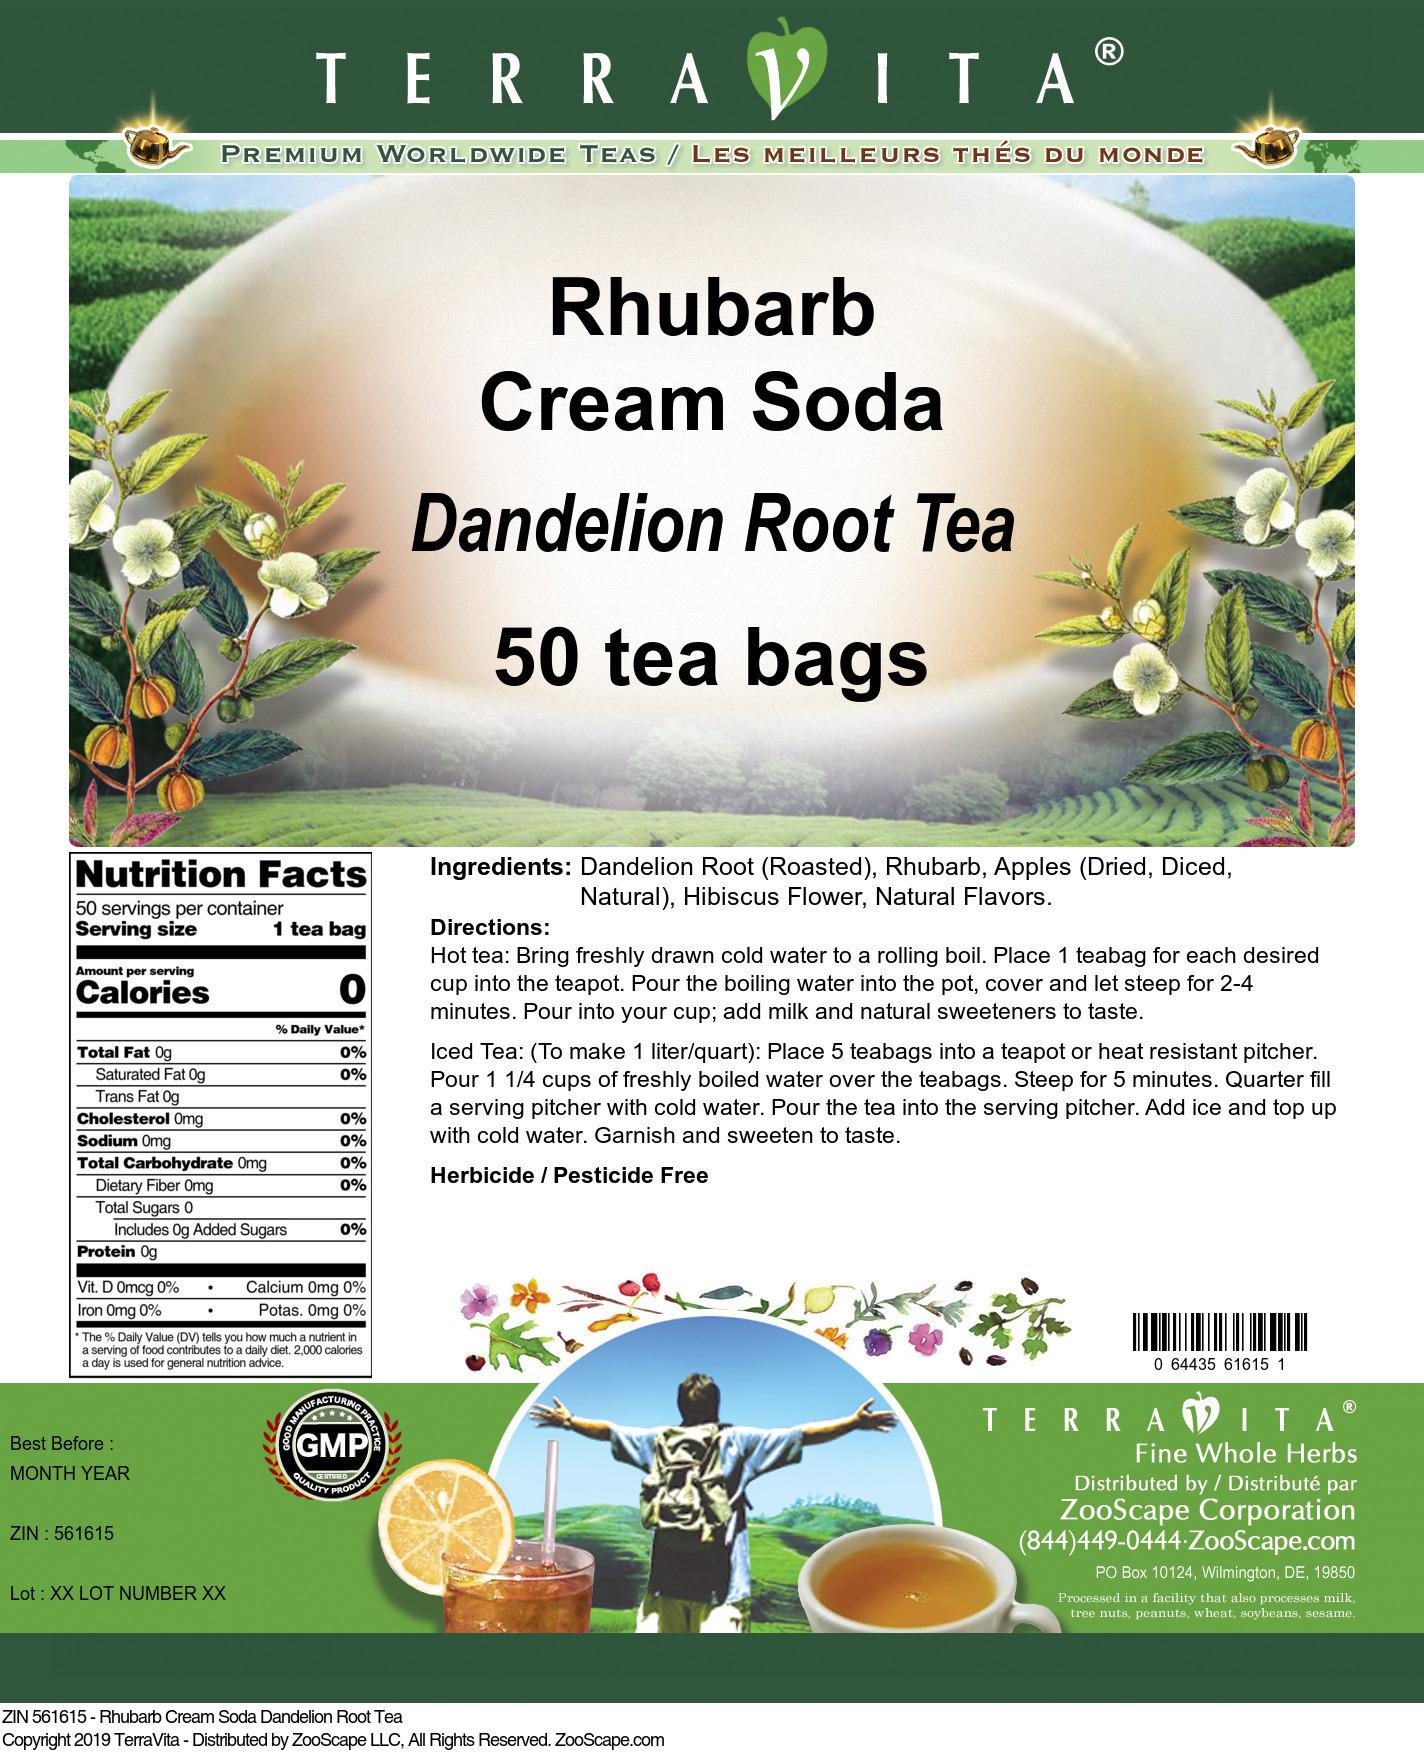 Rhubarb Cream Soda Dandelion Root Tea